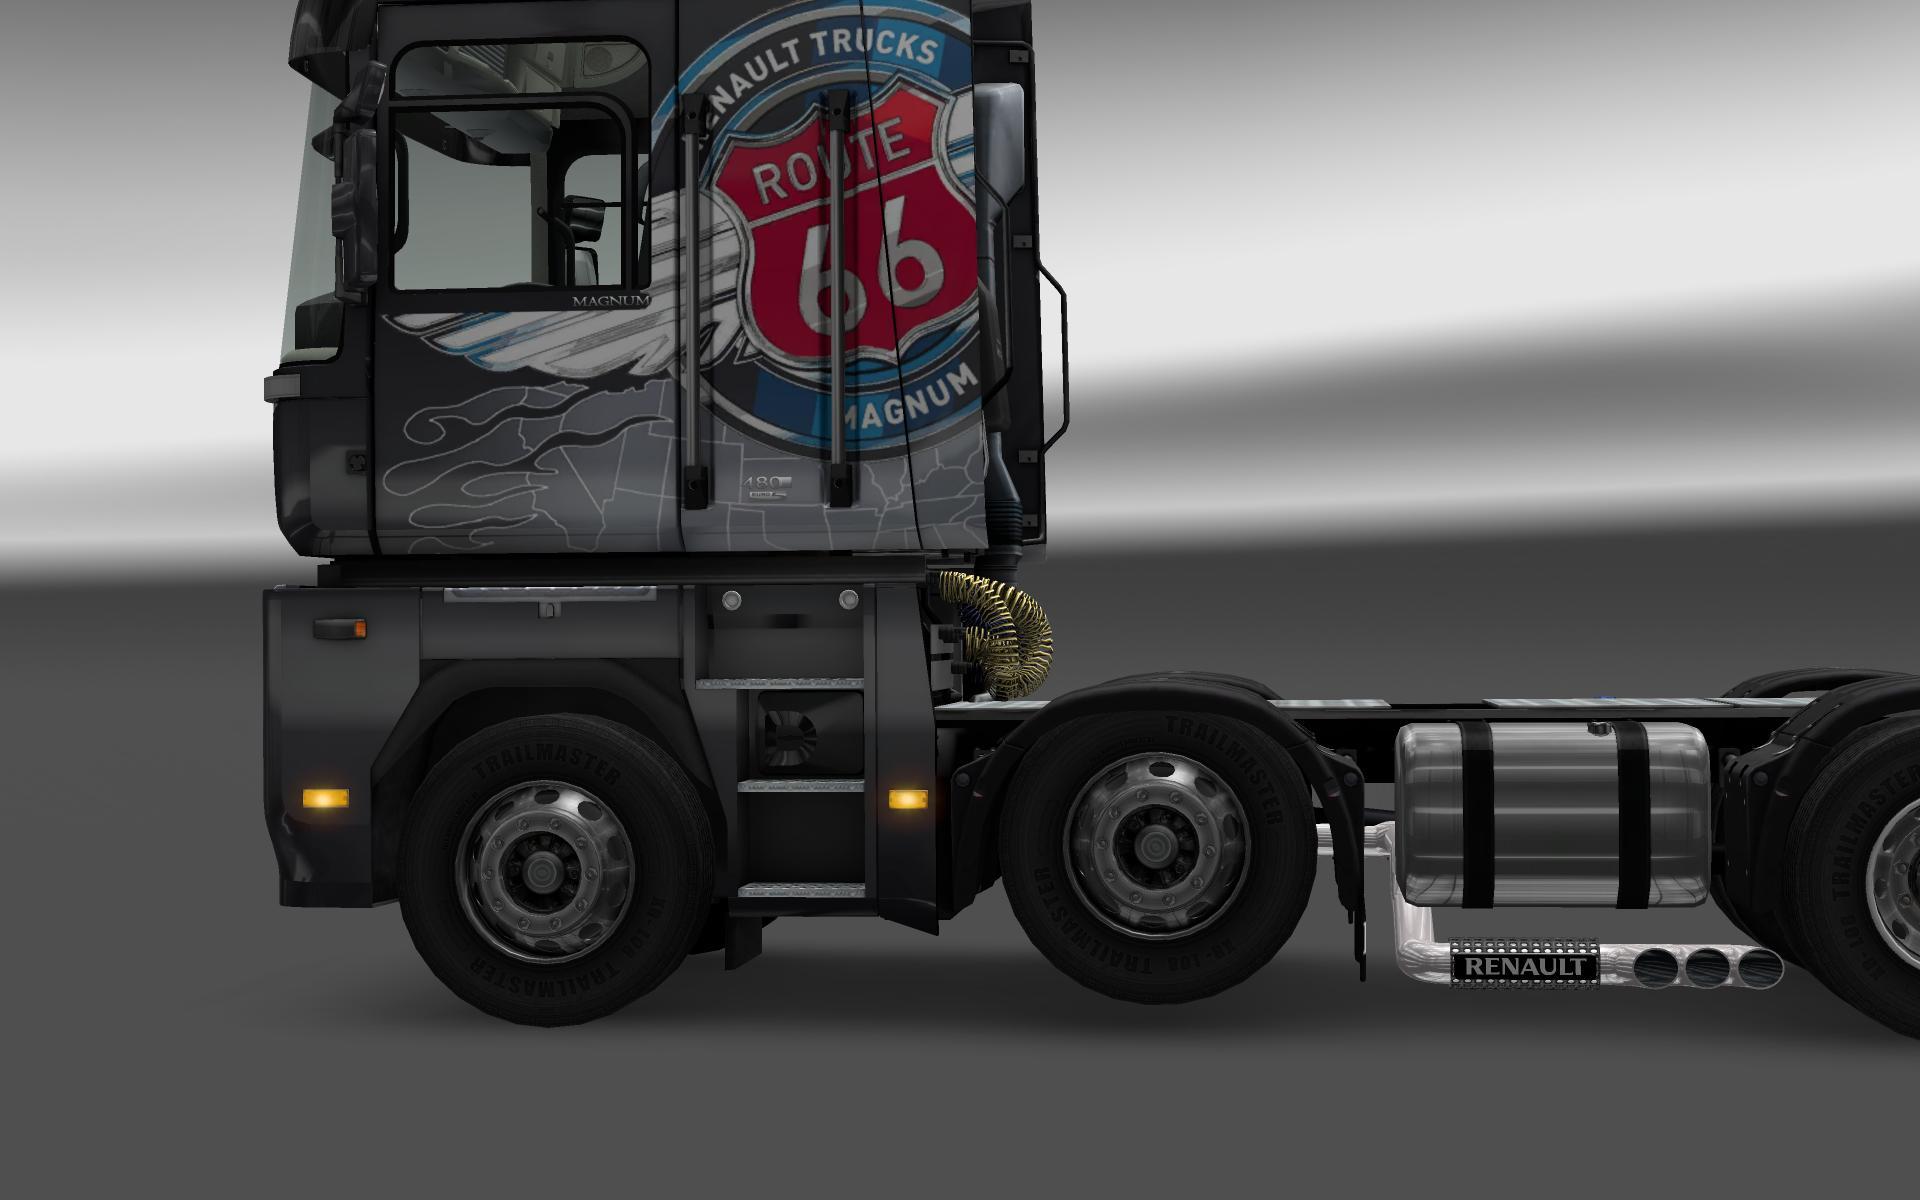 euro truck симулятор 3 моды